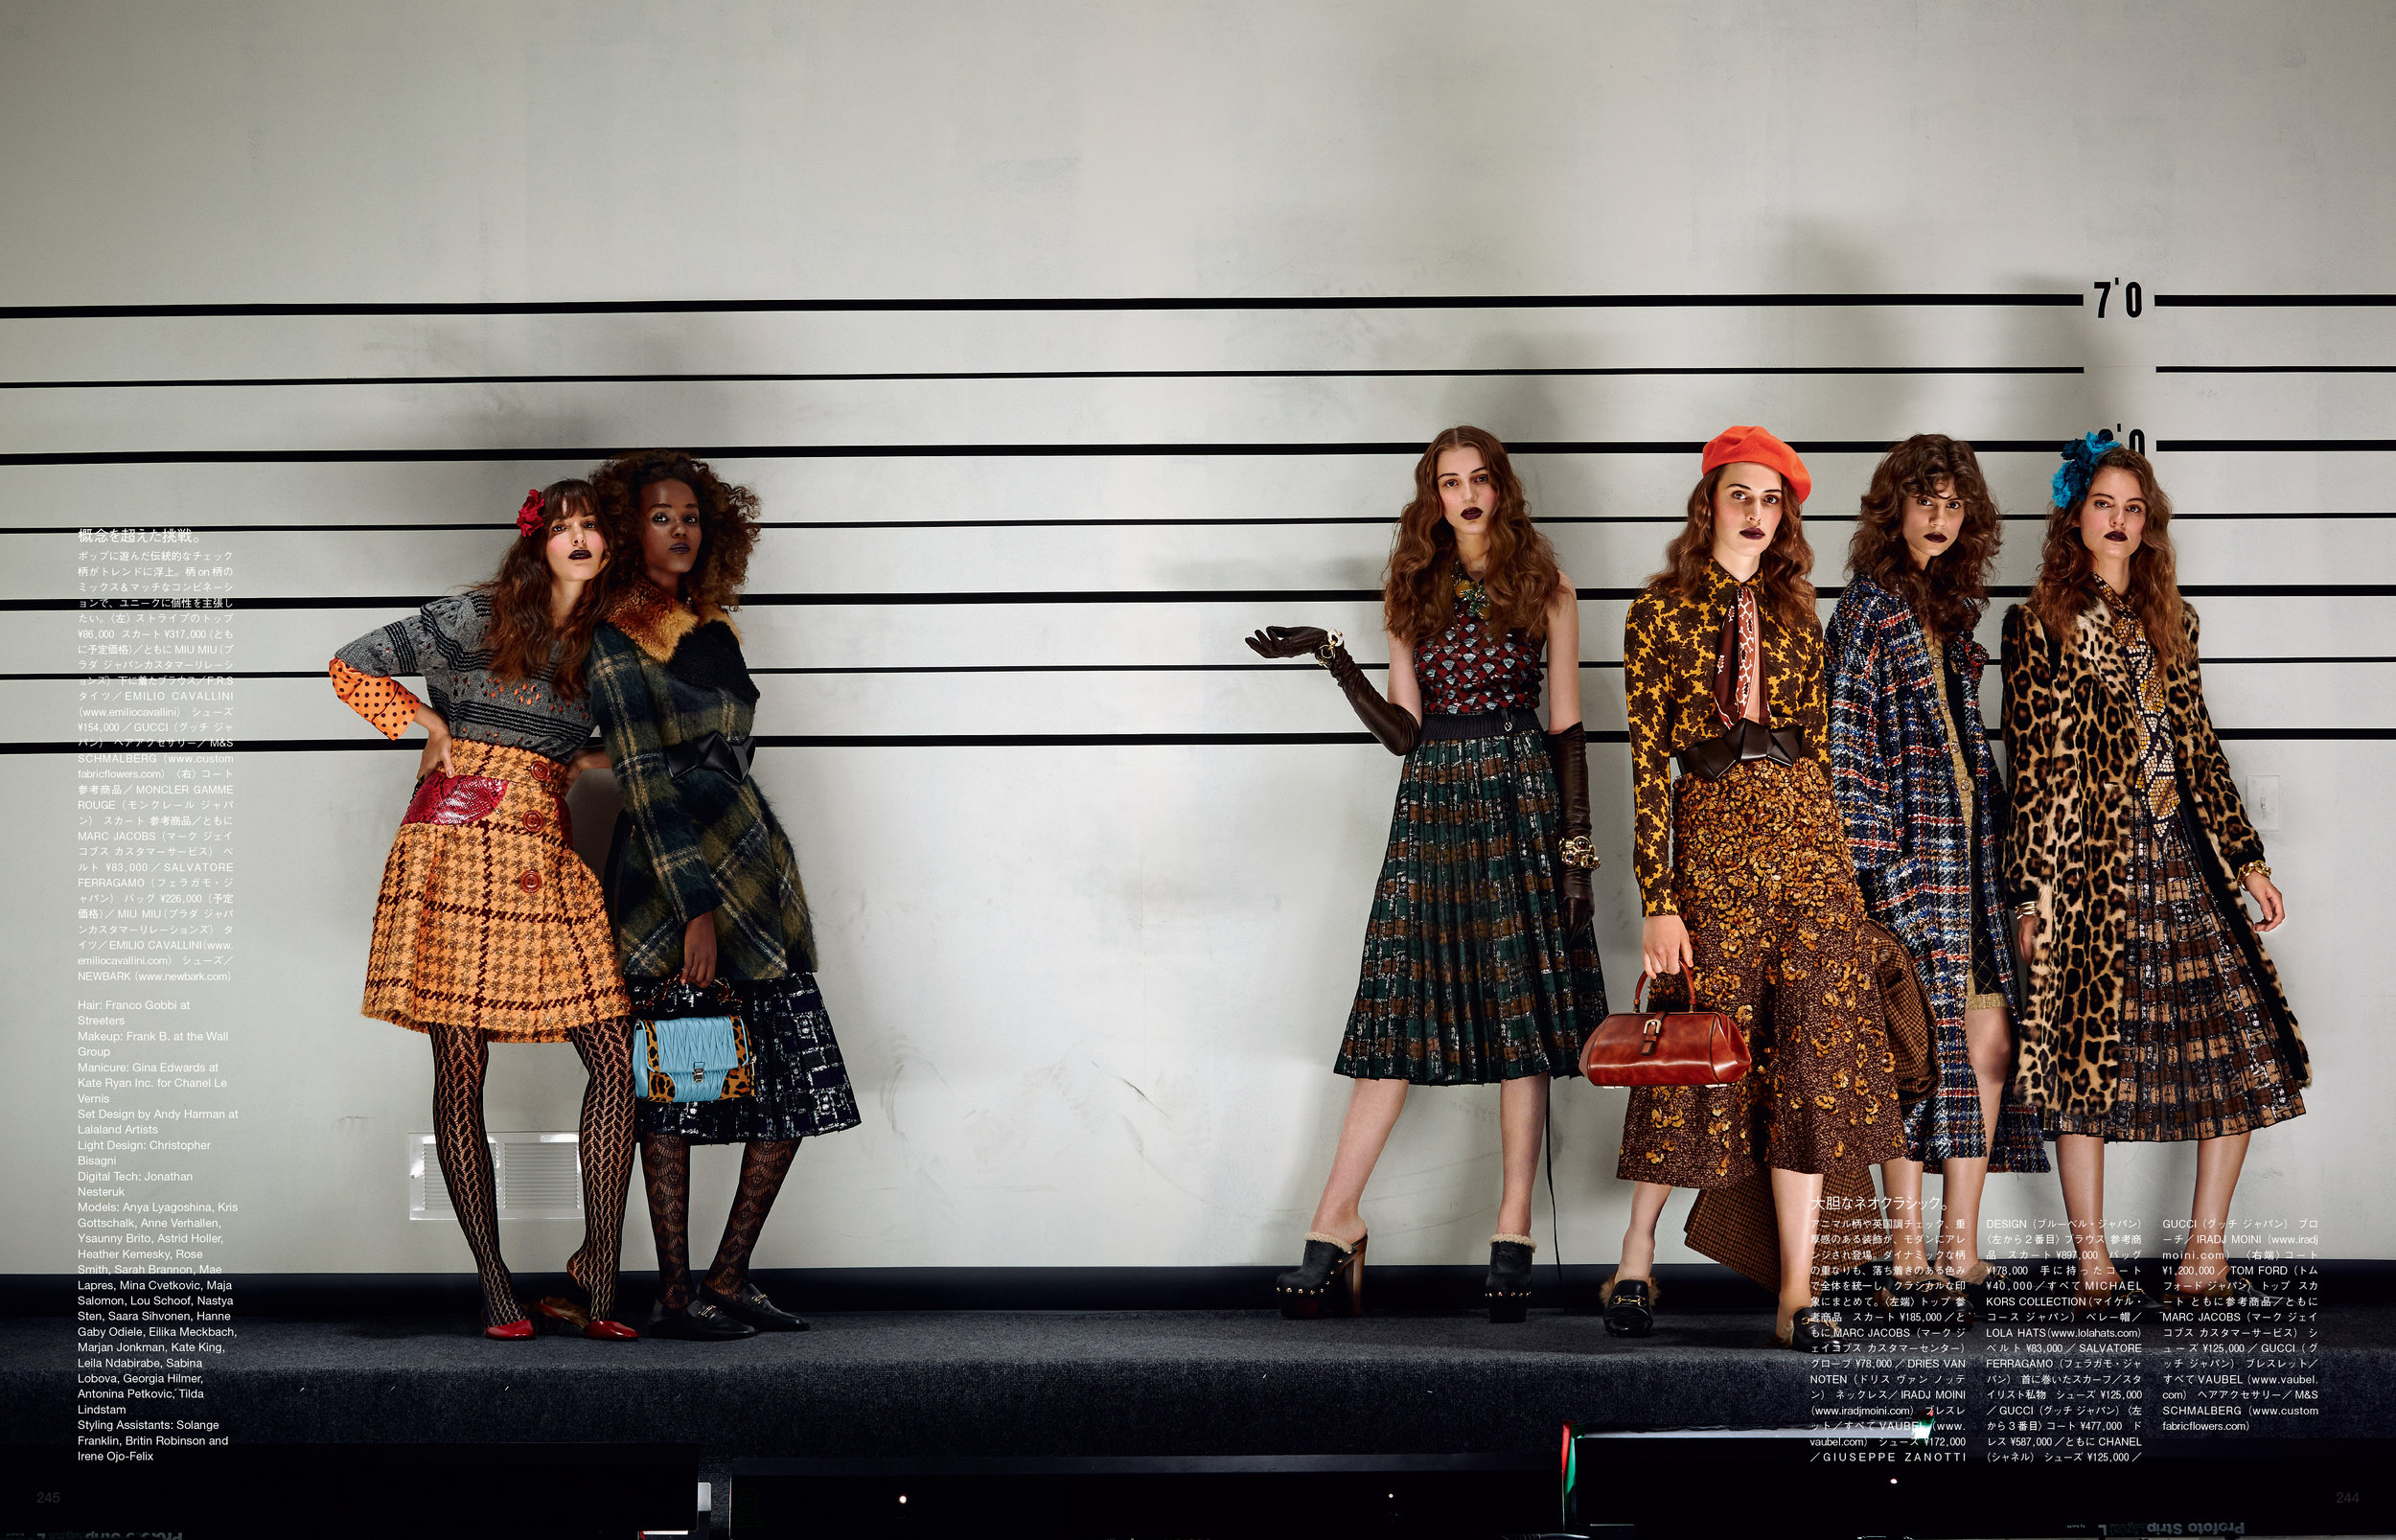 Giovanna-Battaglia-Vogue-Japan-November-2015-Fashion-Line-Up-4.jpg